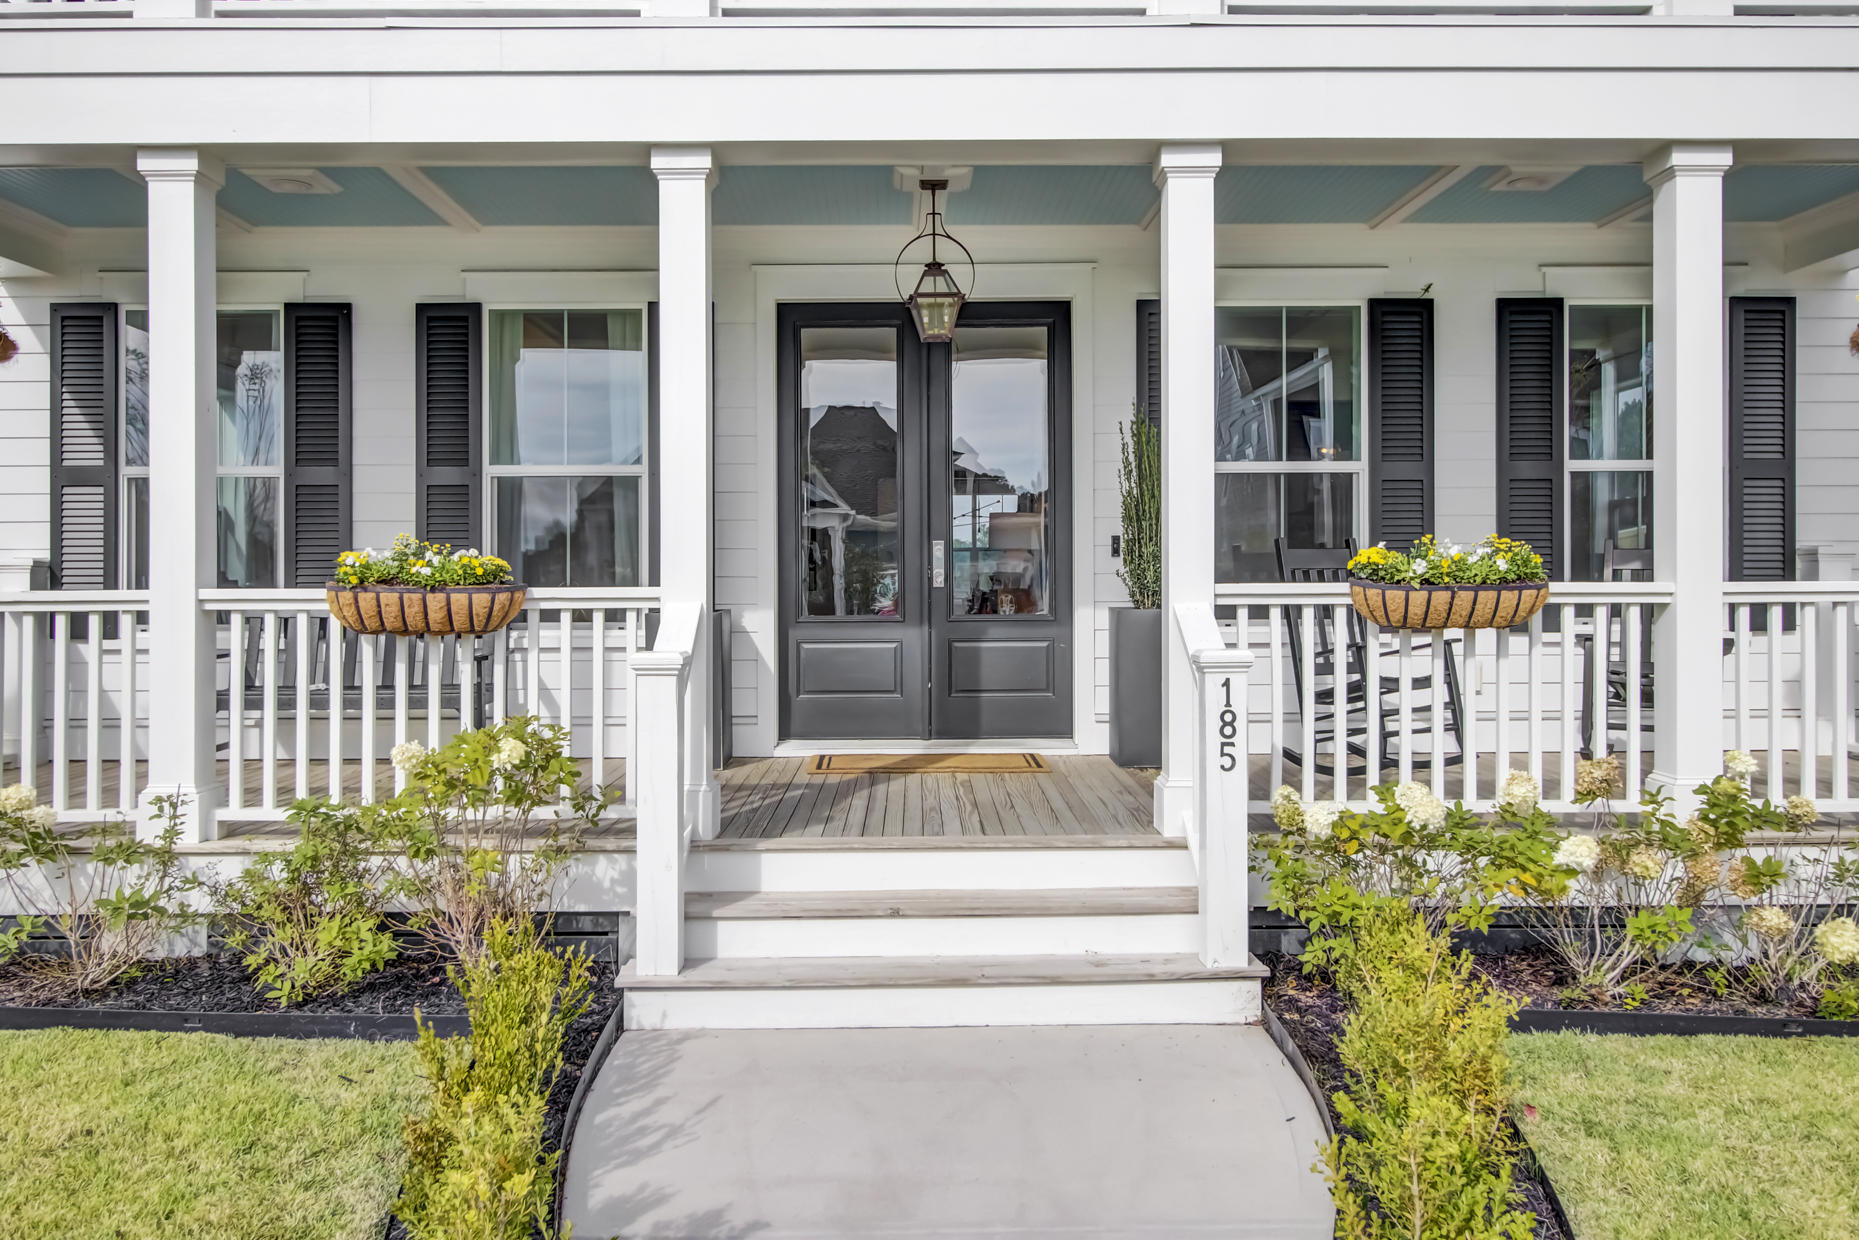 Carnes Crossroads Homes For Sale - 185 Callibluff, Summerville, SC - 1